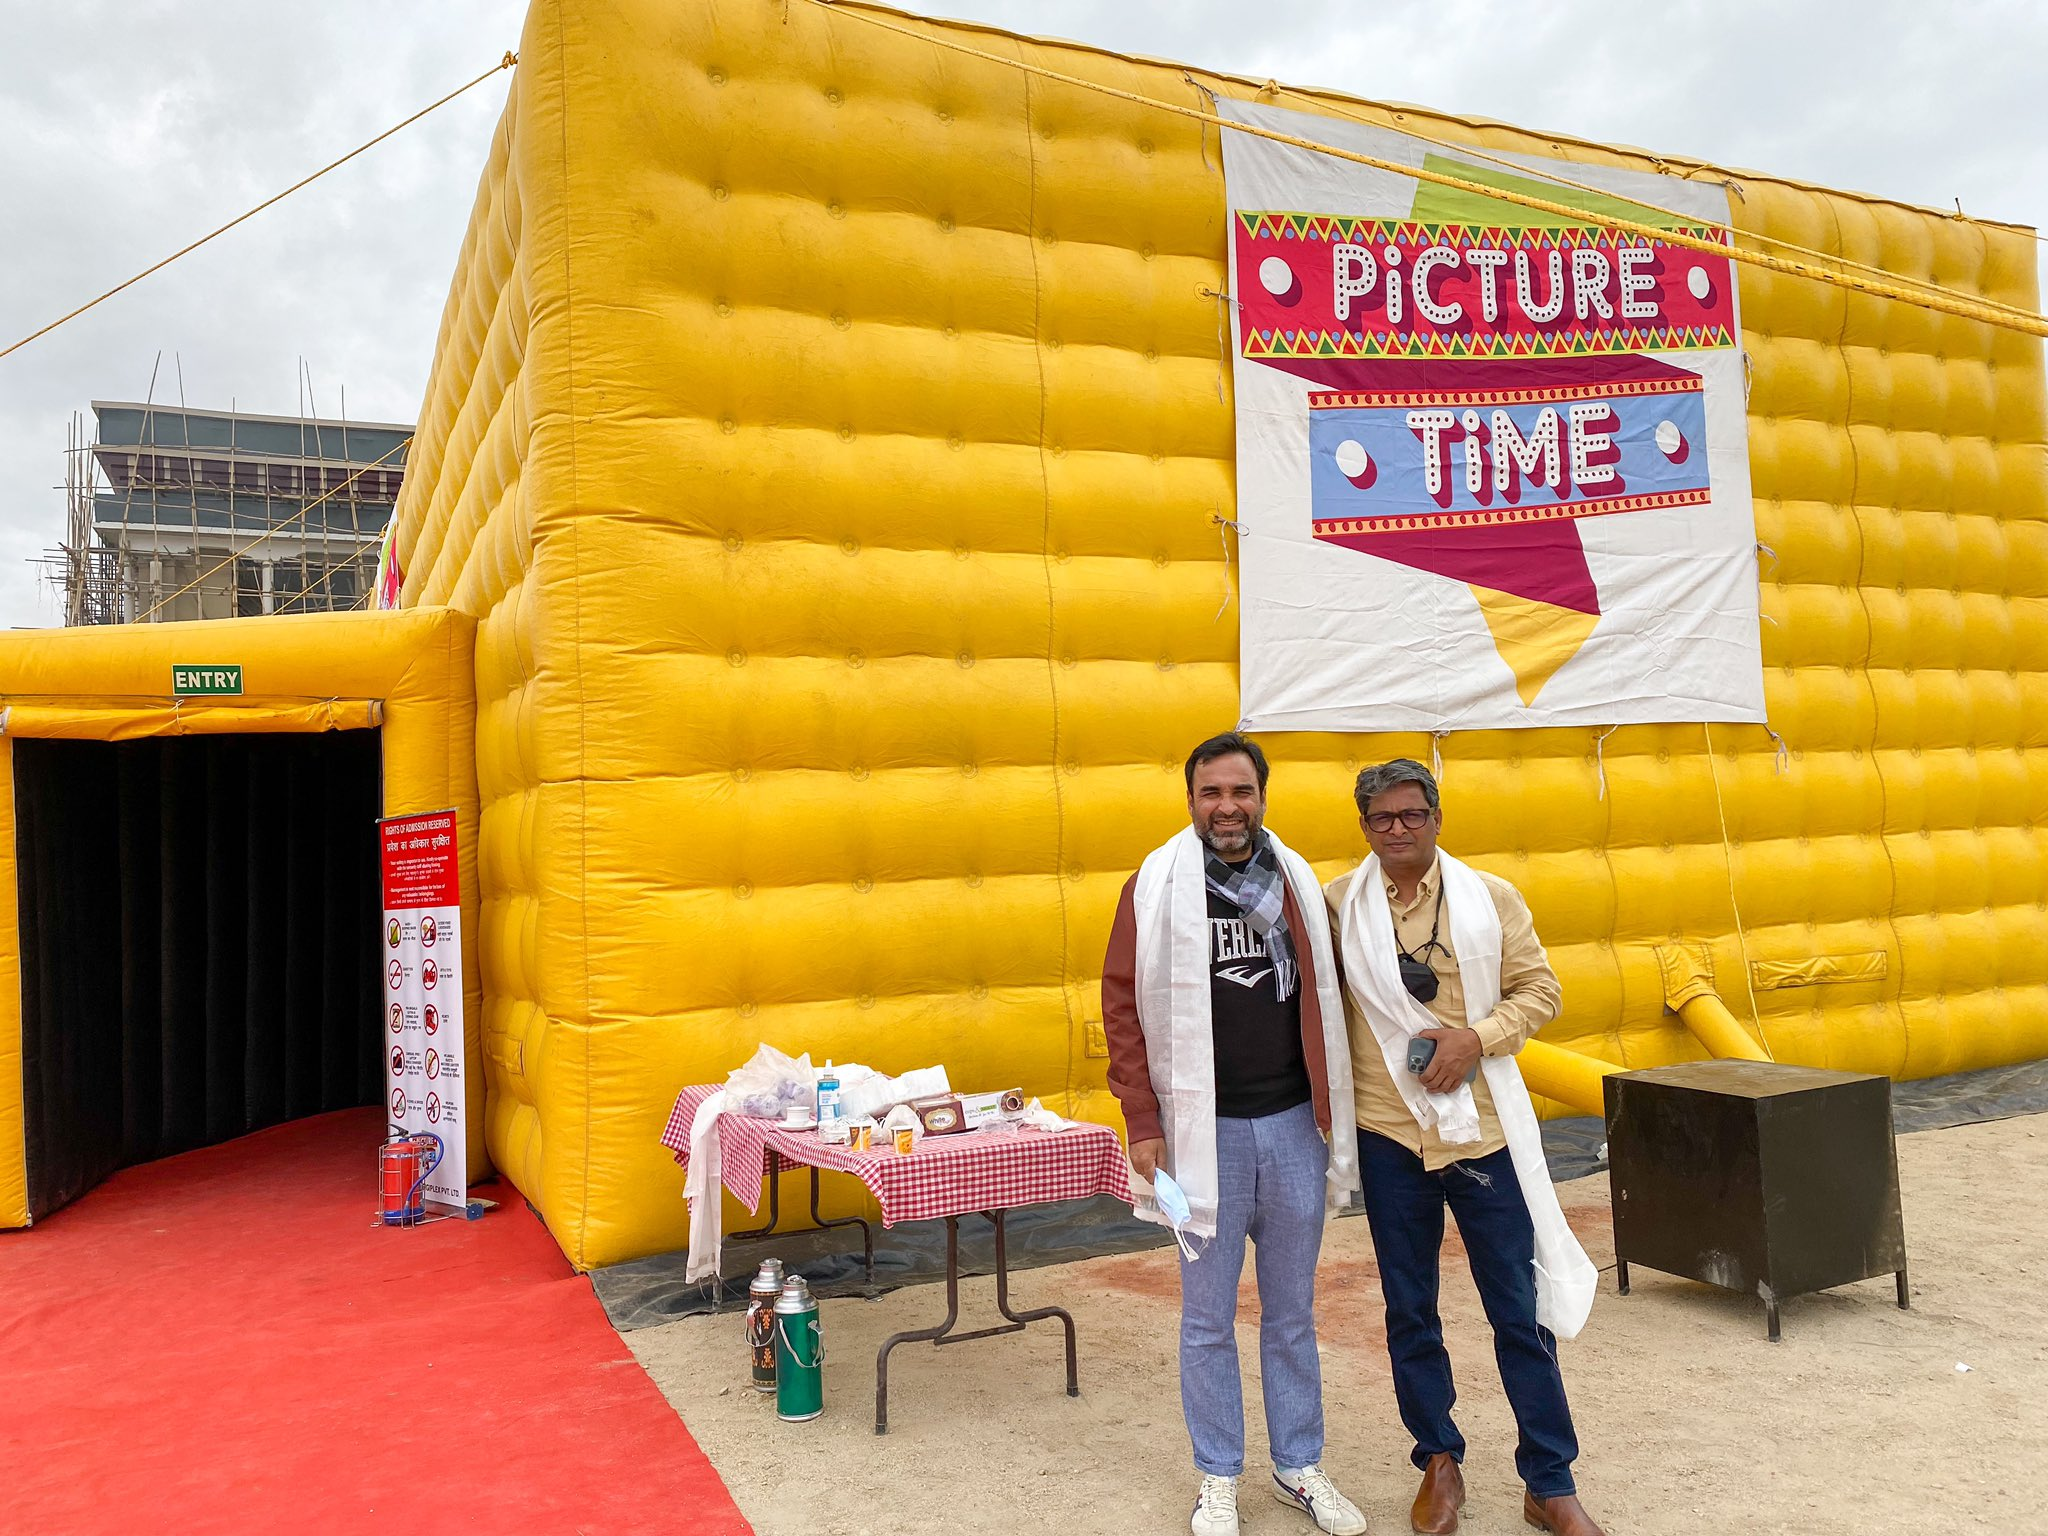 Actor Pankaj Tripathi at Ladakh's world's highest movie theatre